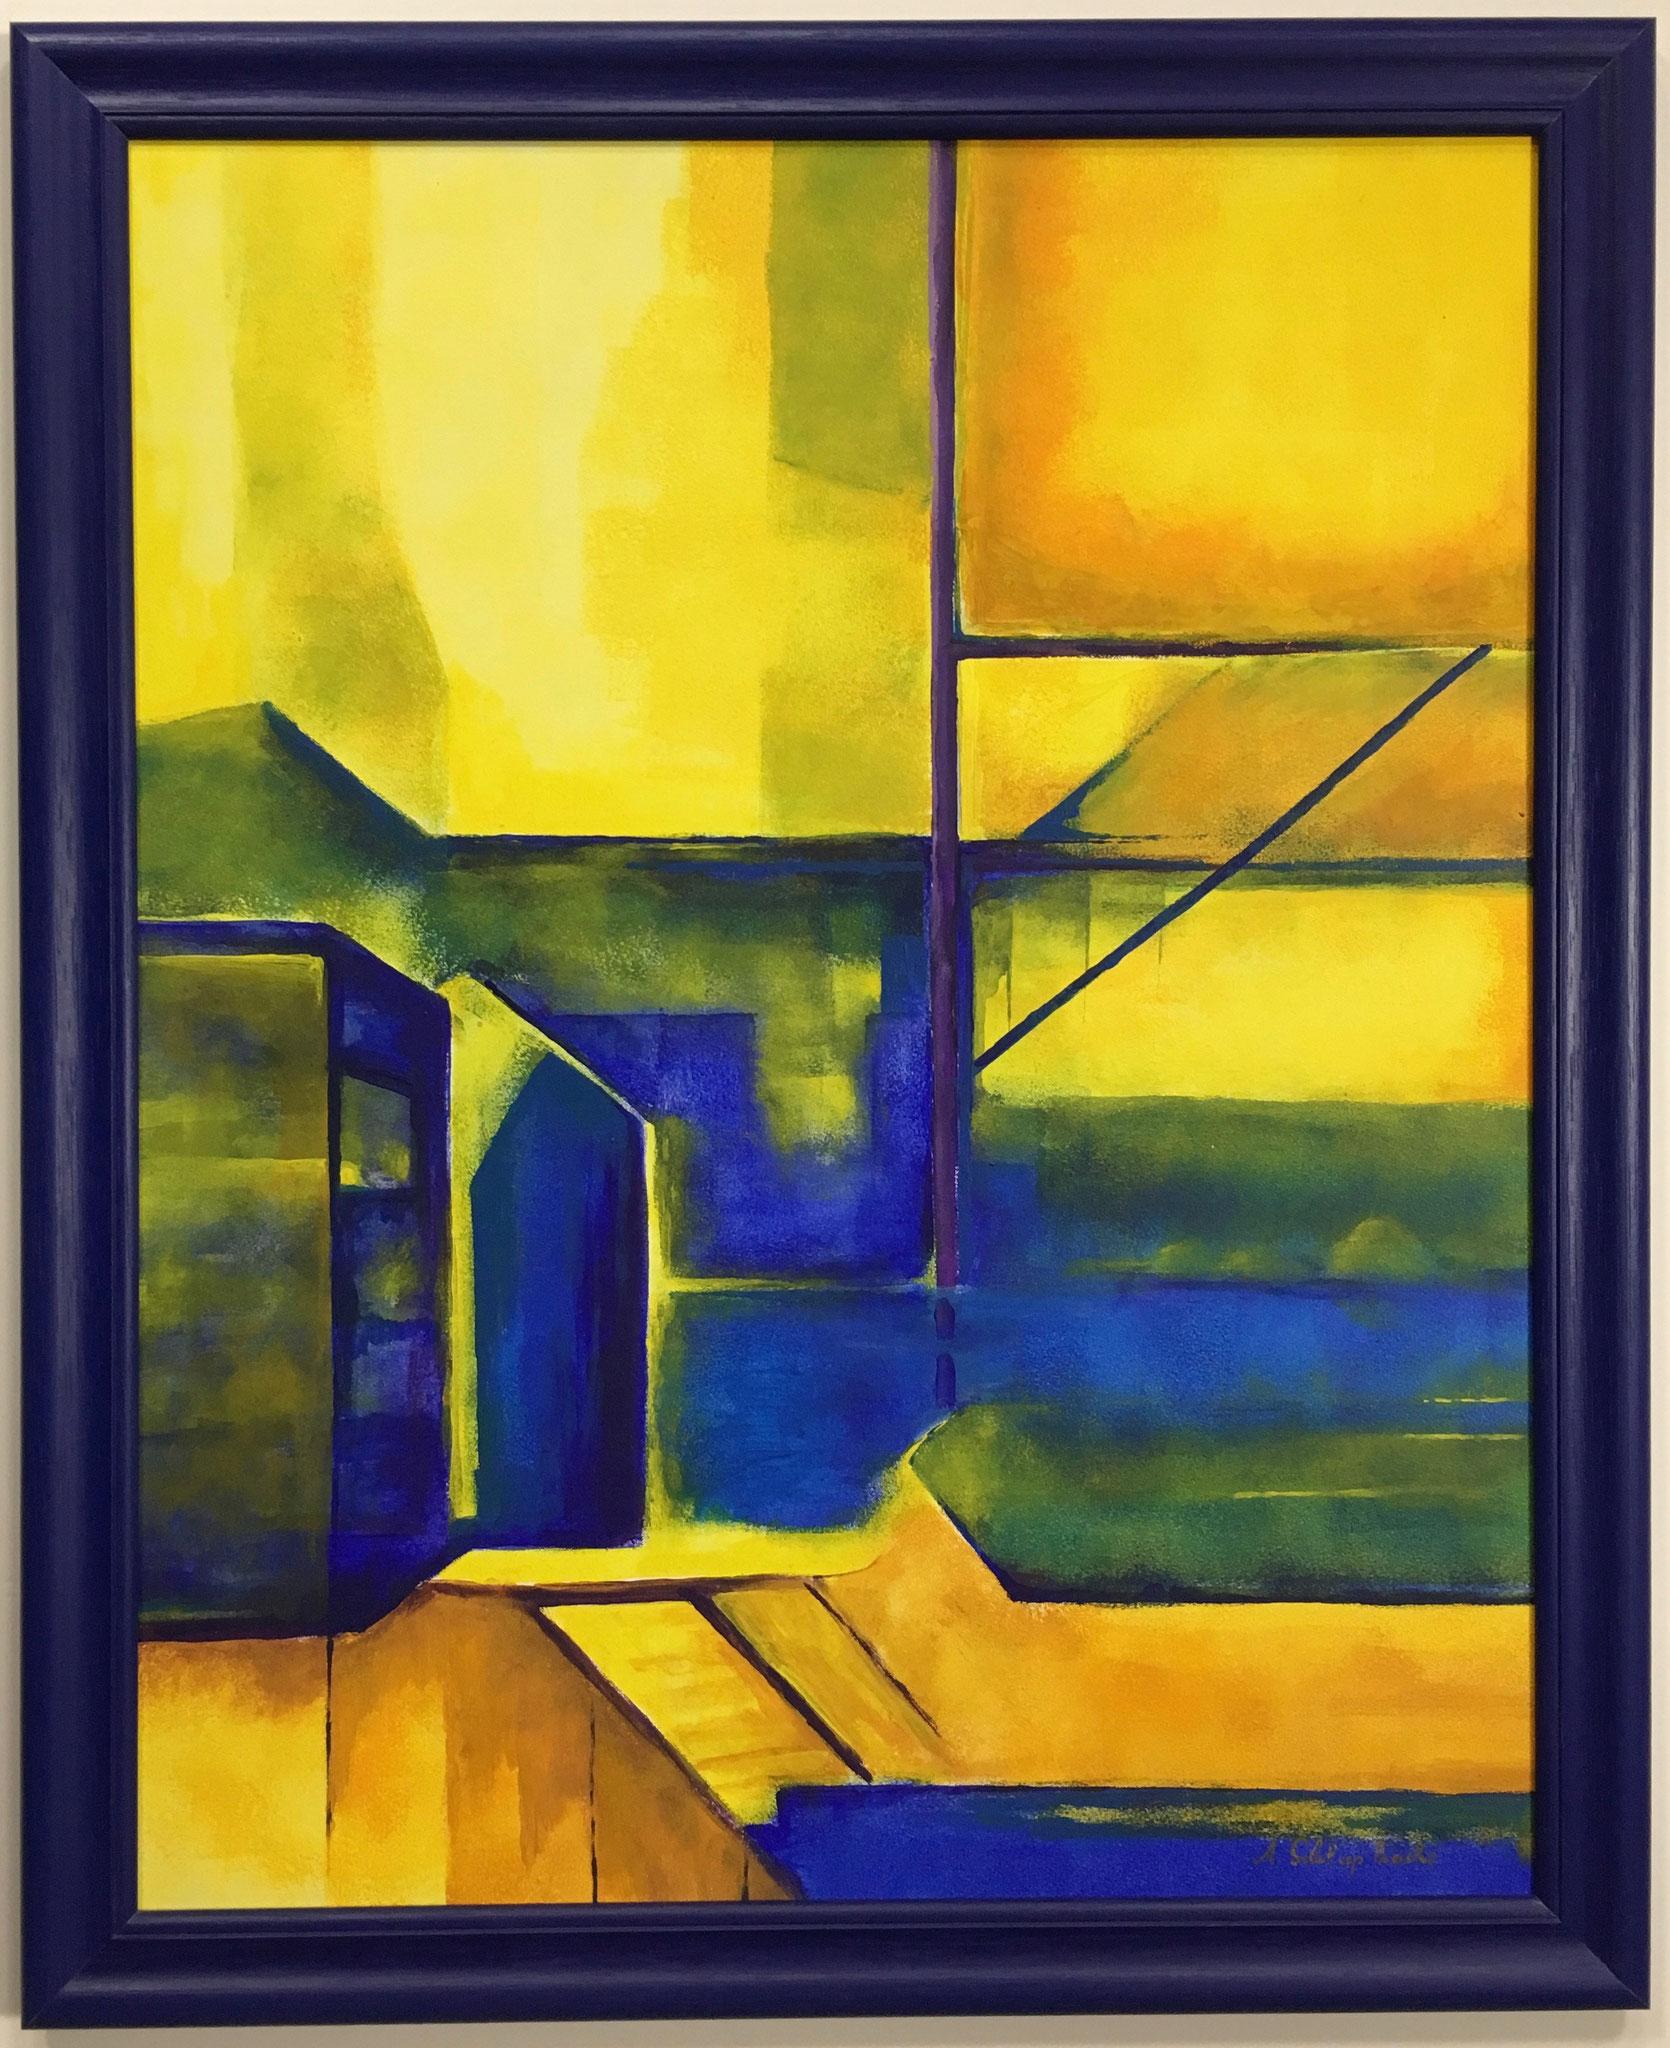 "Anne Schliephacke "" Komposition blau im gelb"" Acrylbild Größe/Falzmaß: 60,0 x 75,0cm € 1.350,-"